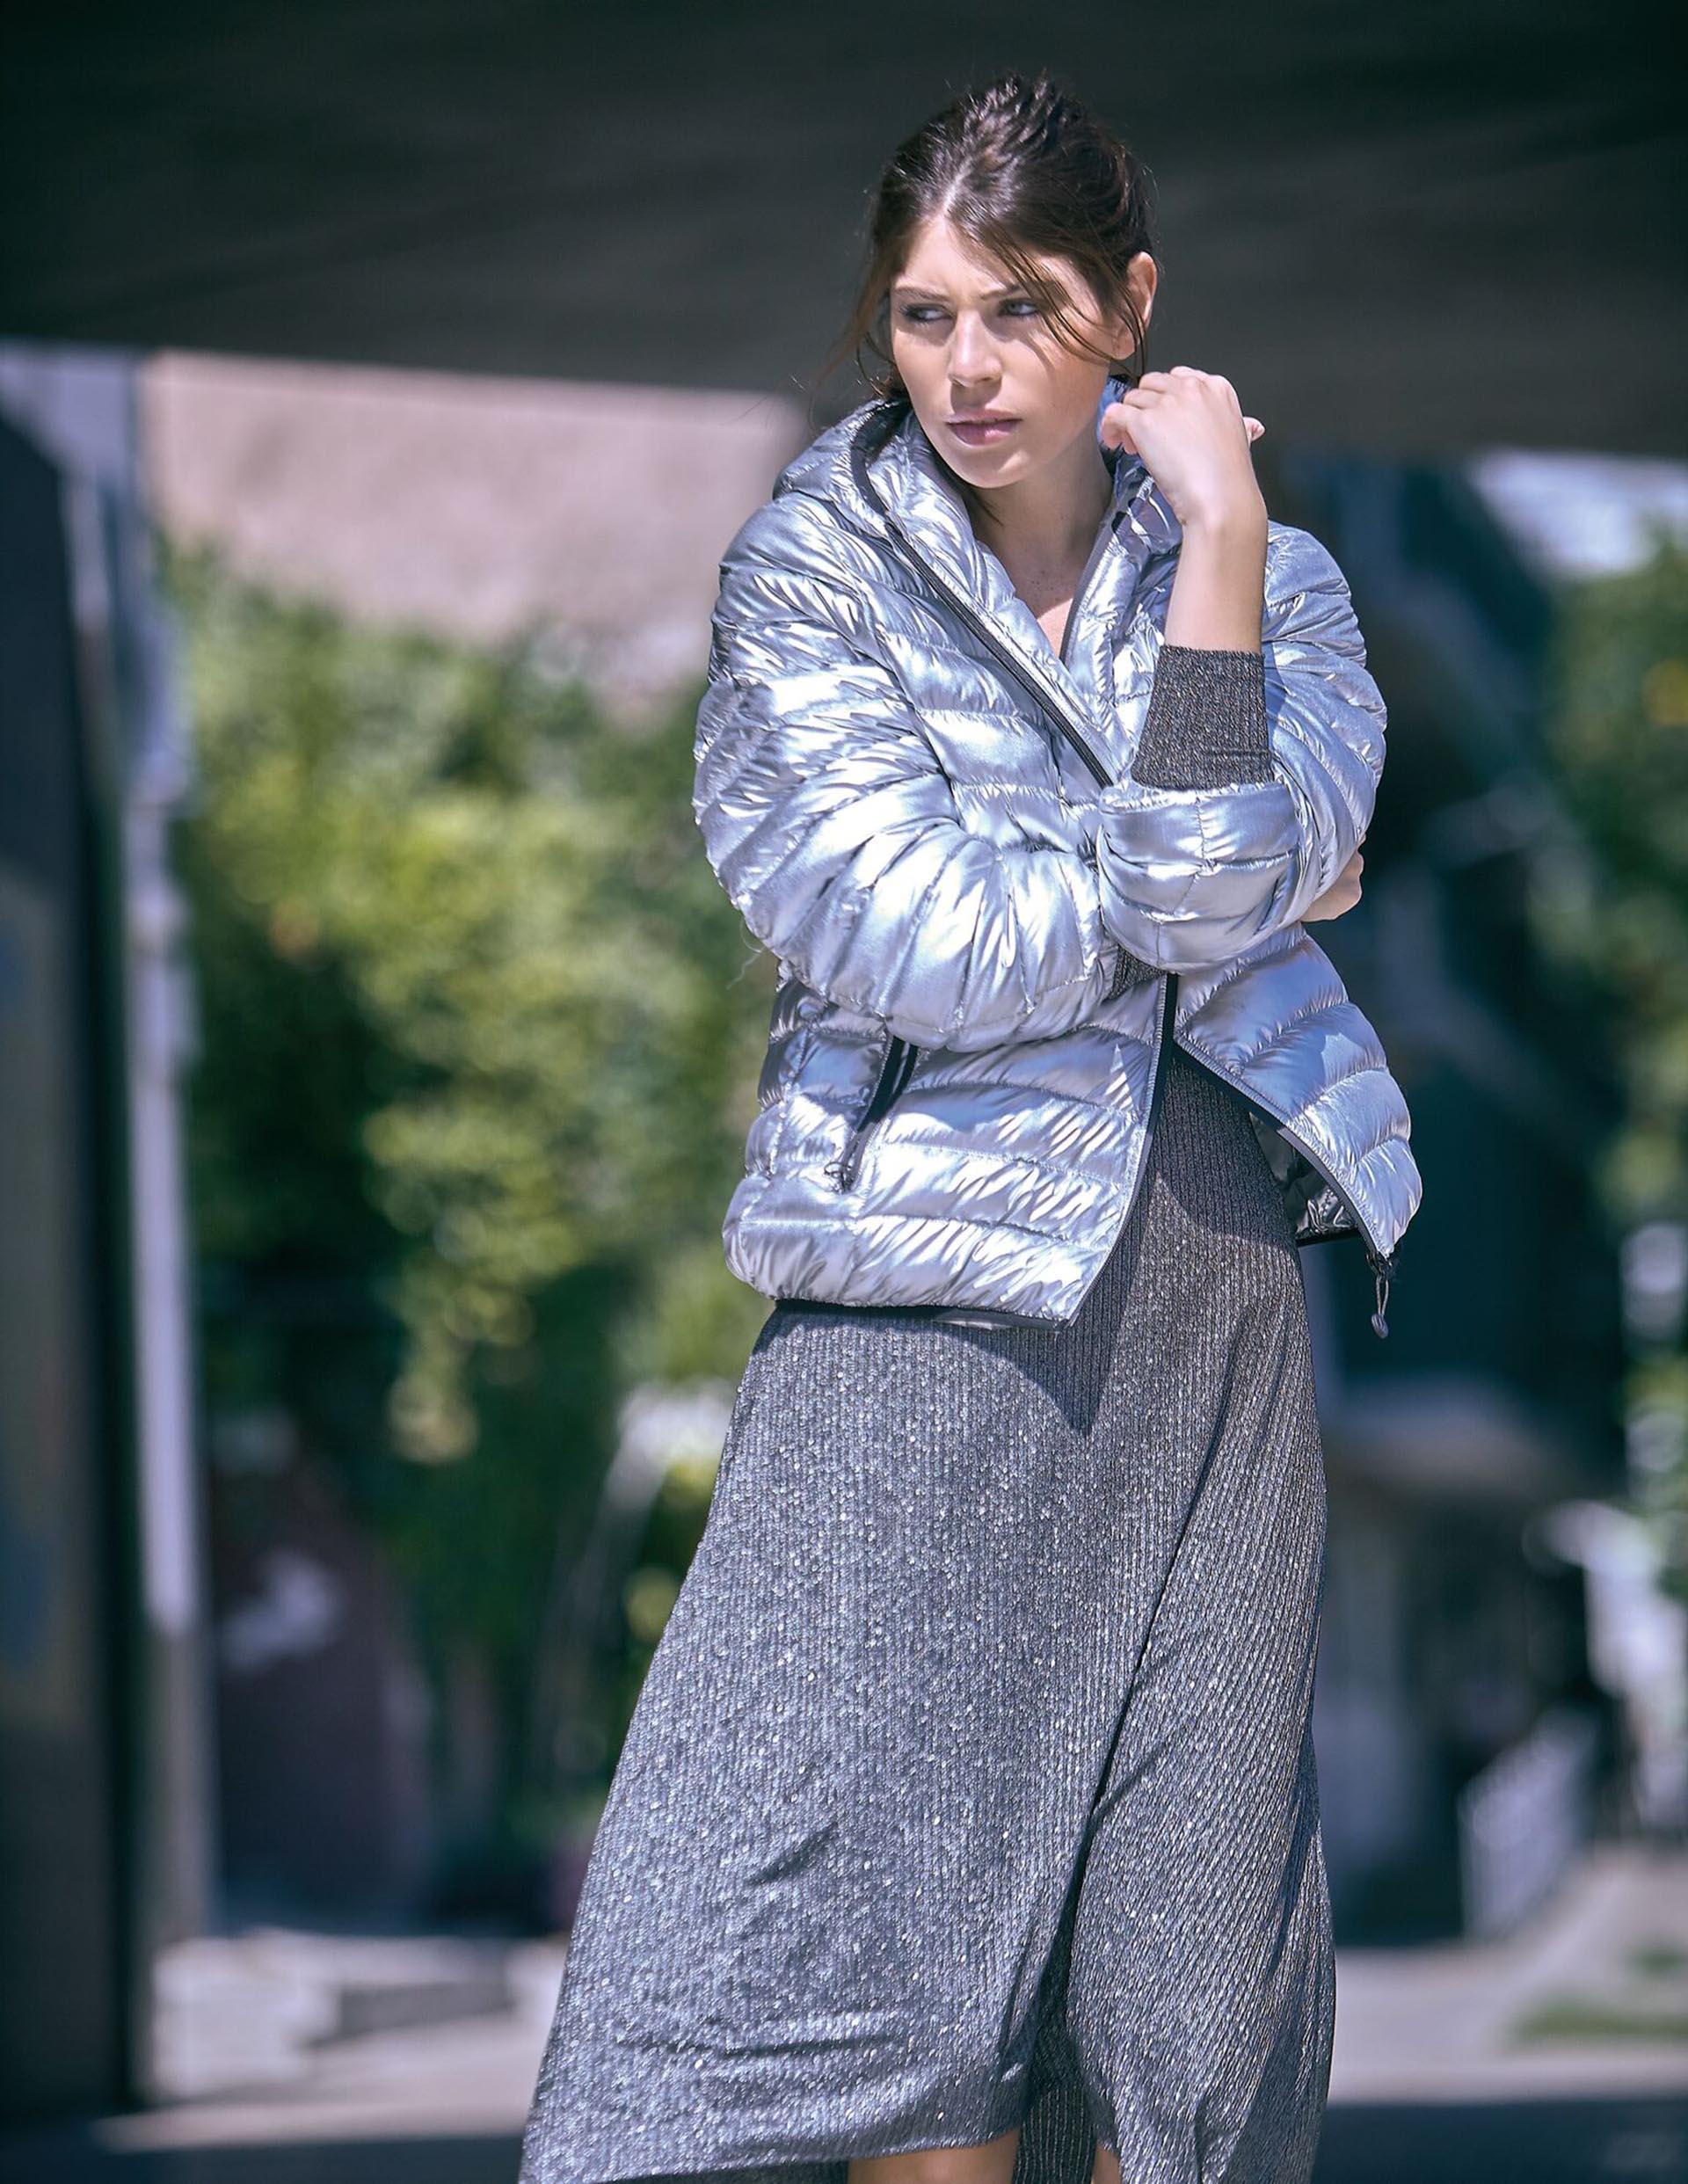 Vestido de lúrex irregular ($ 2.685, AY Not Dead) y campera inflable ($ 2.200, XL Extra Large).